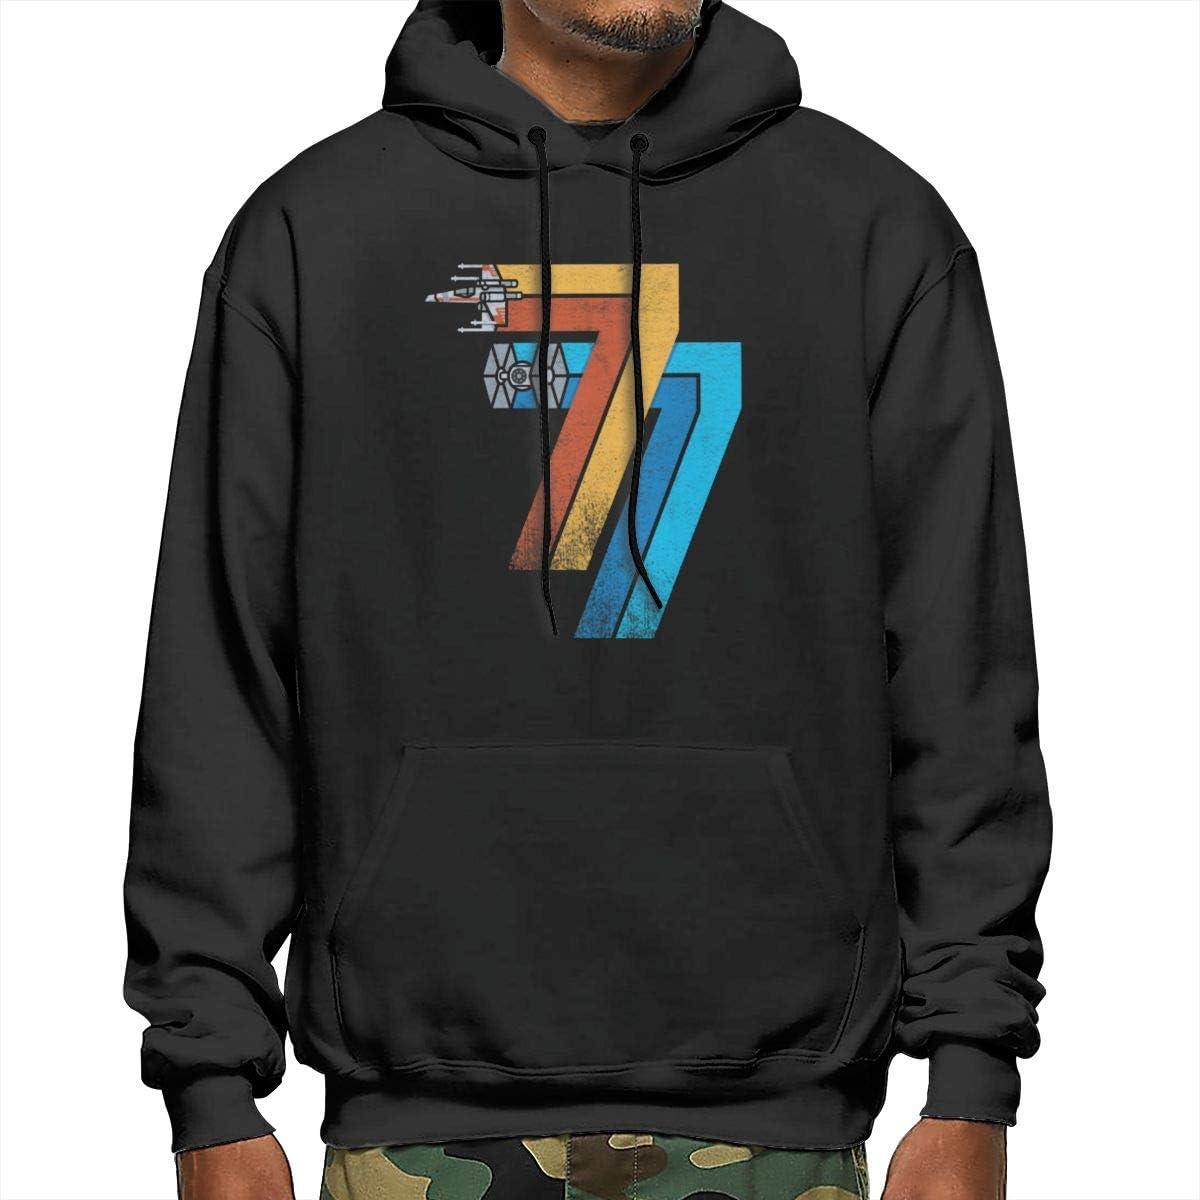 Sanda May 25th 1977 Mens Hooded Sweatshirt